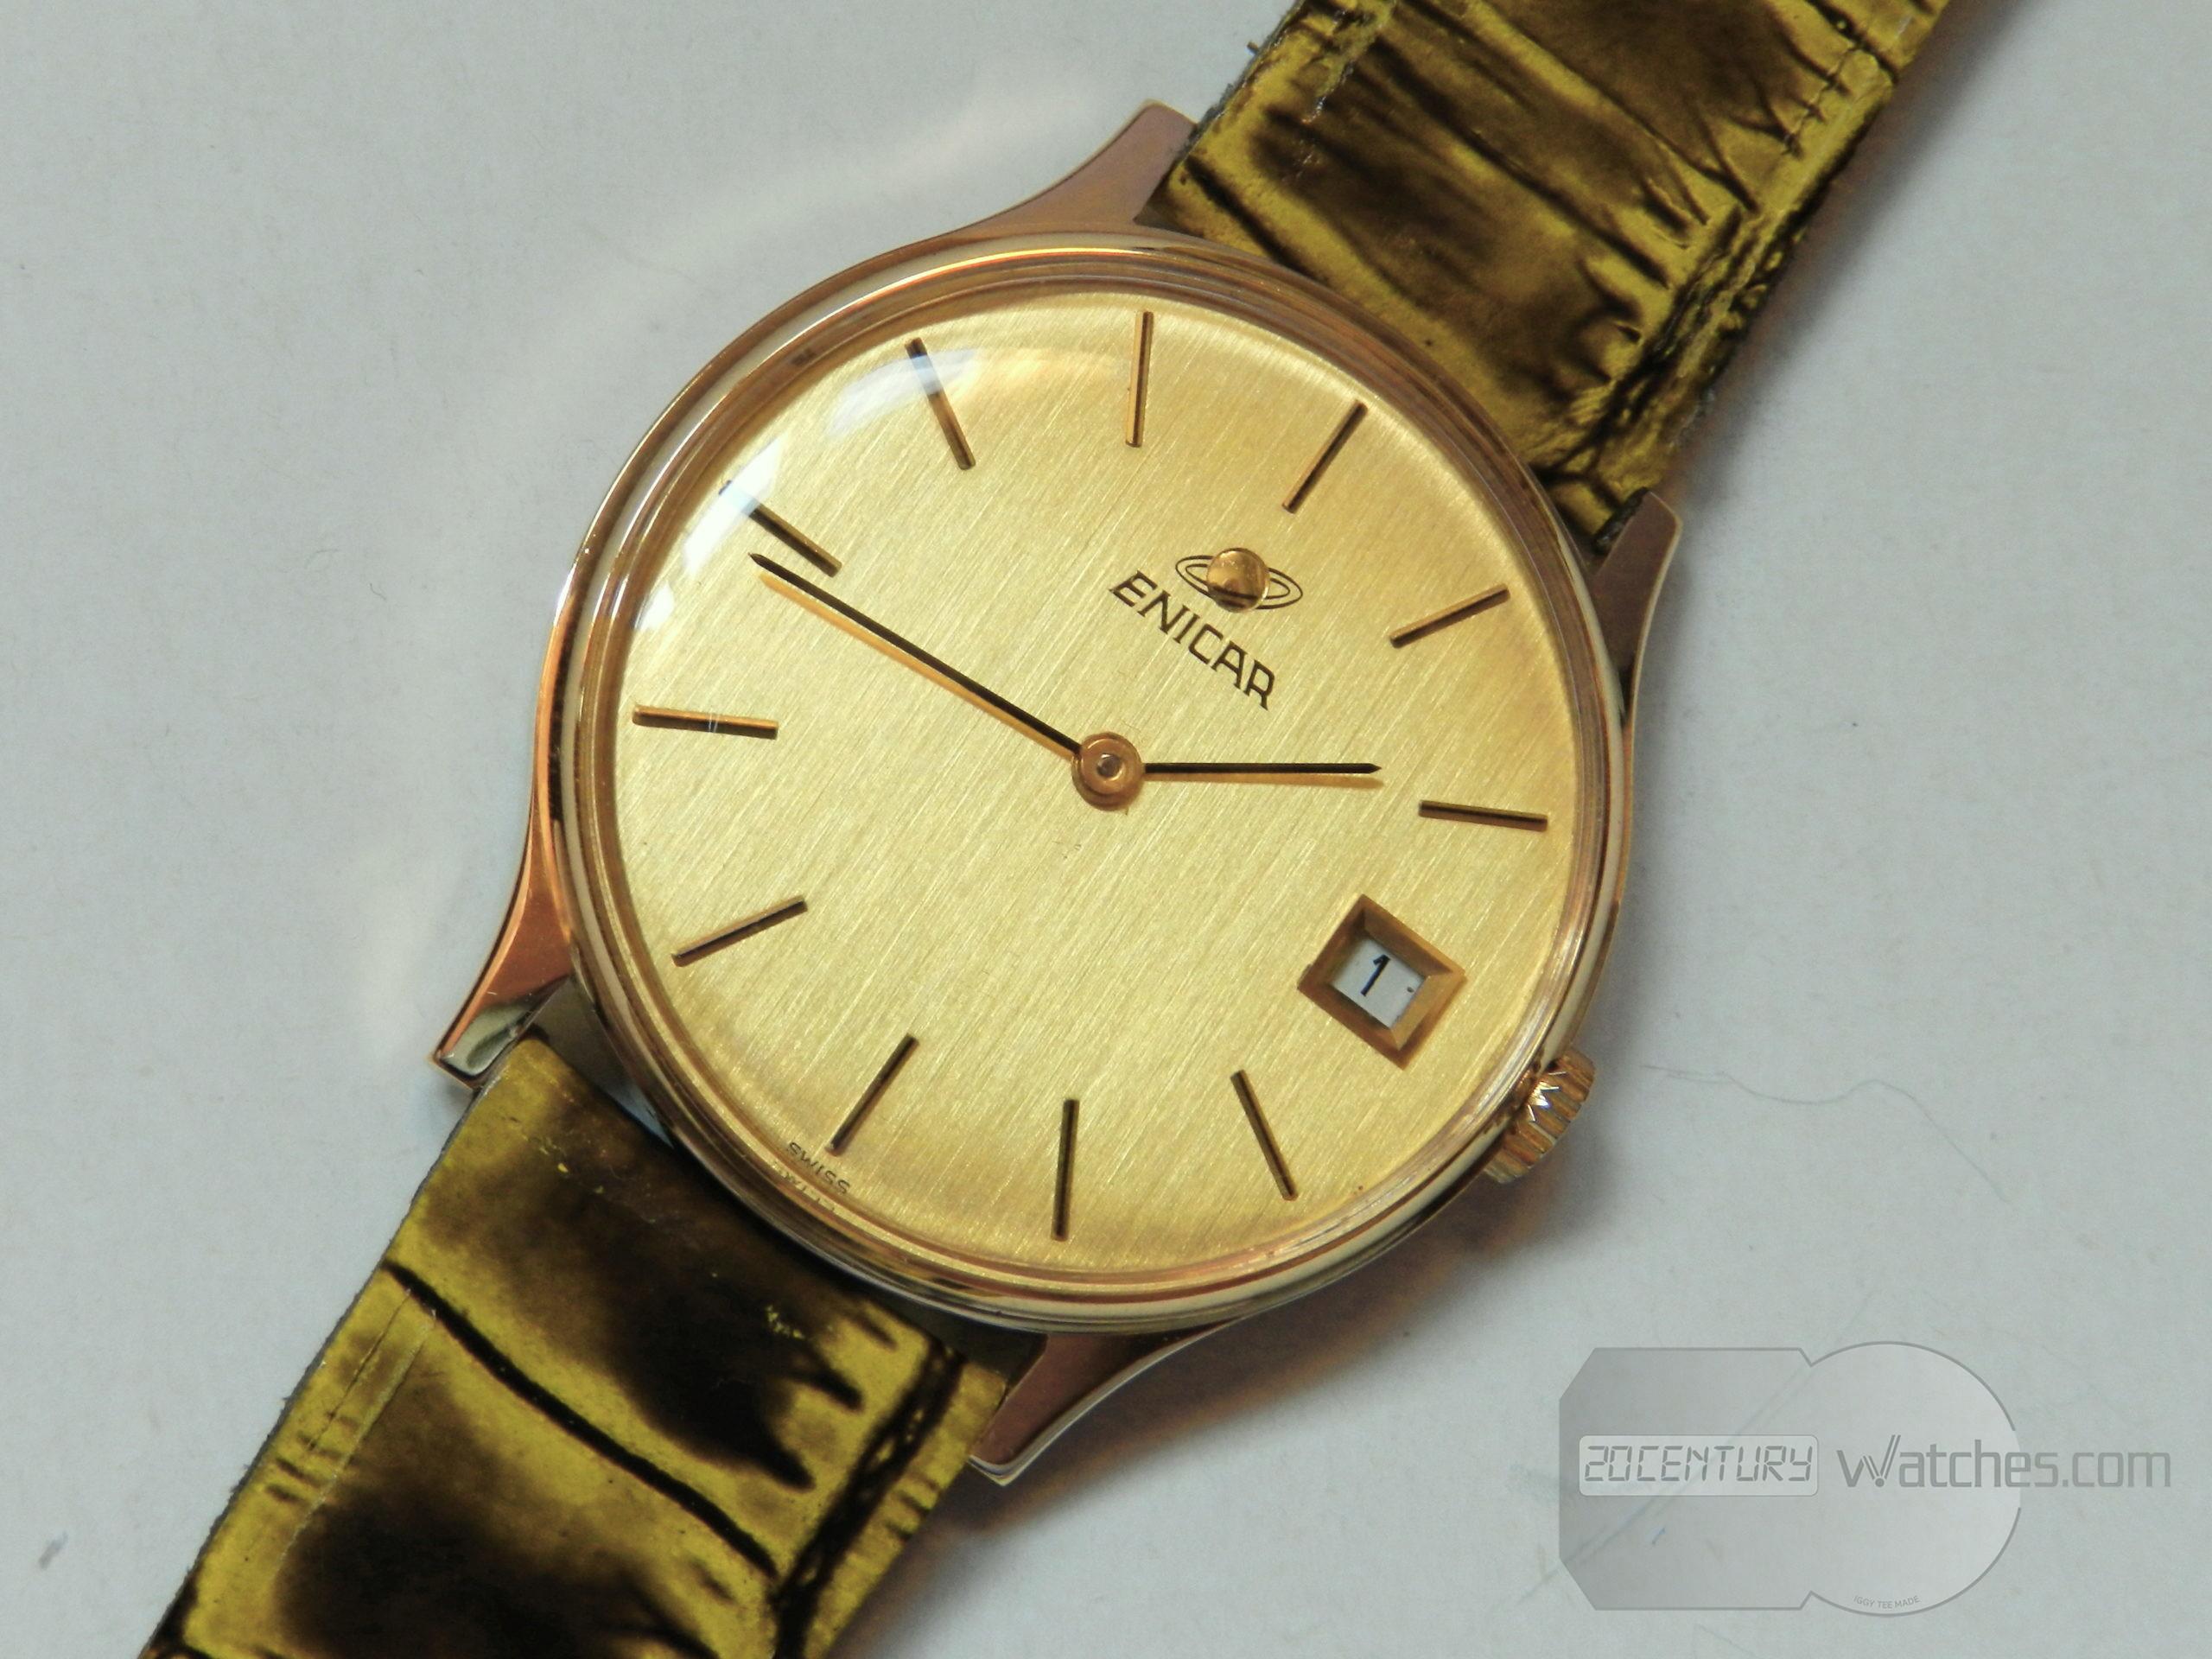 Enicar classic watch